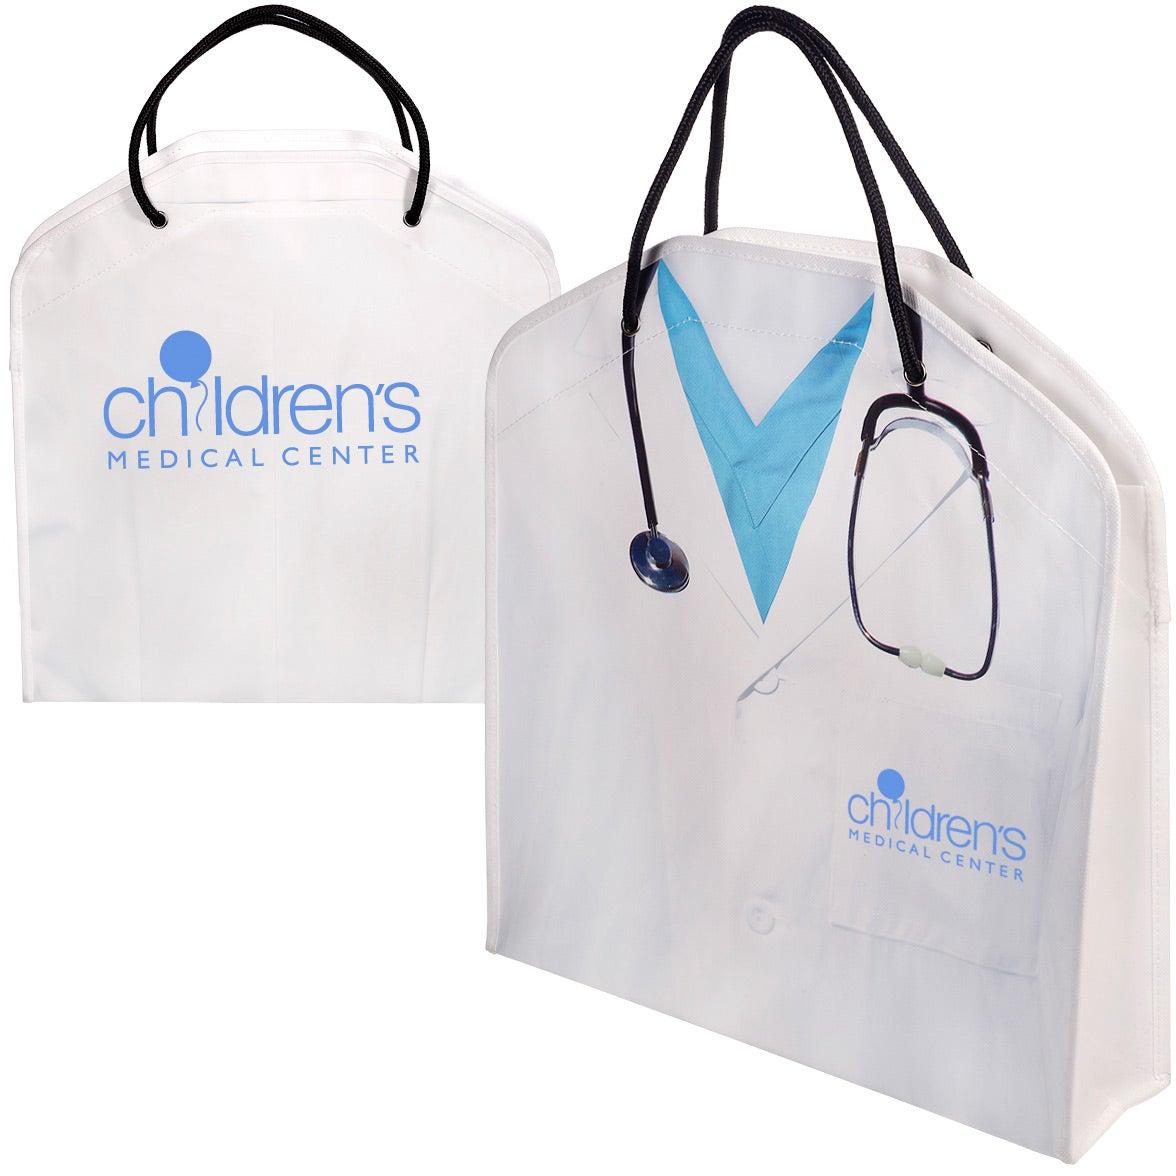 White Doctor Tote Bag Branded